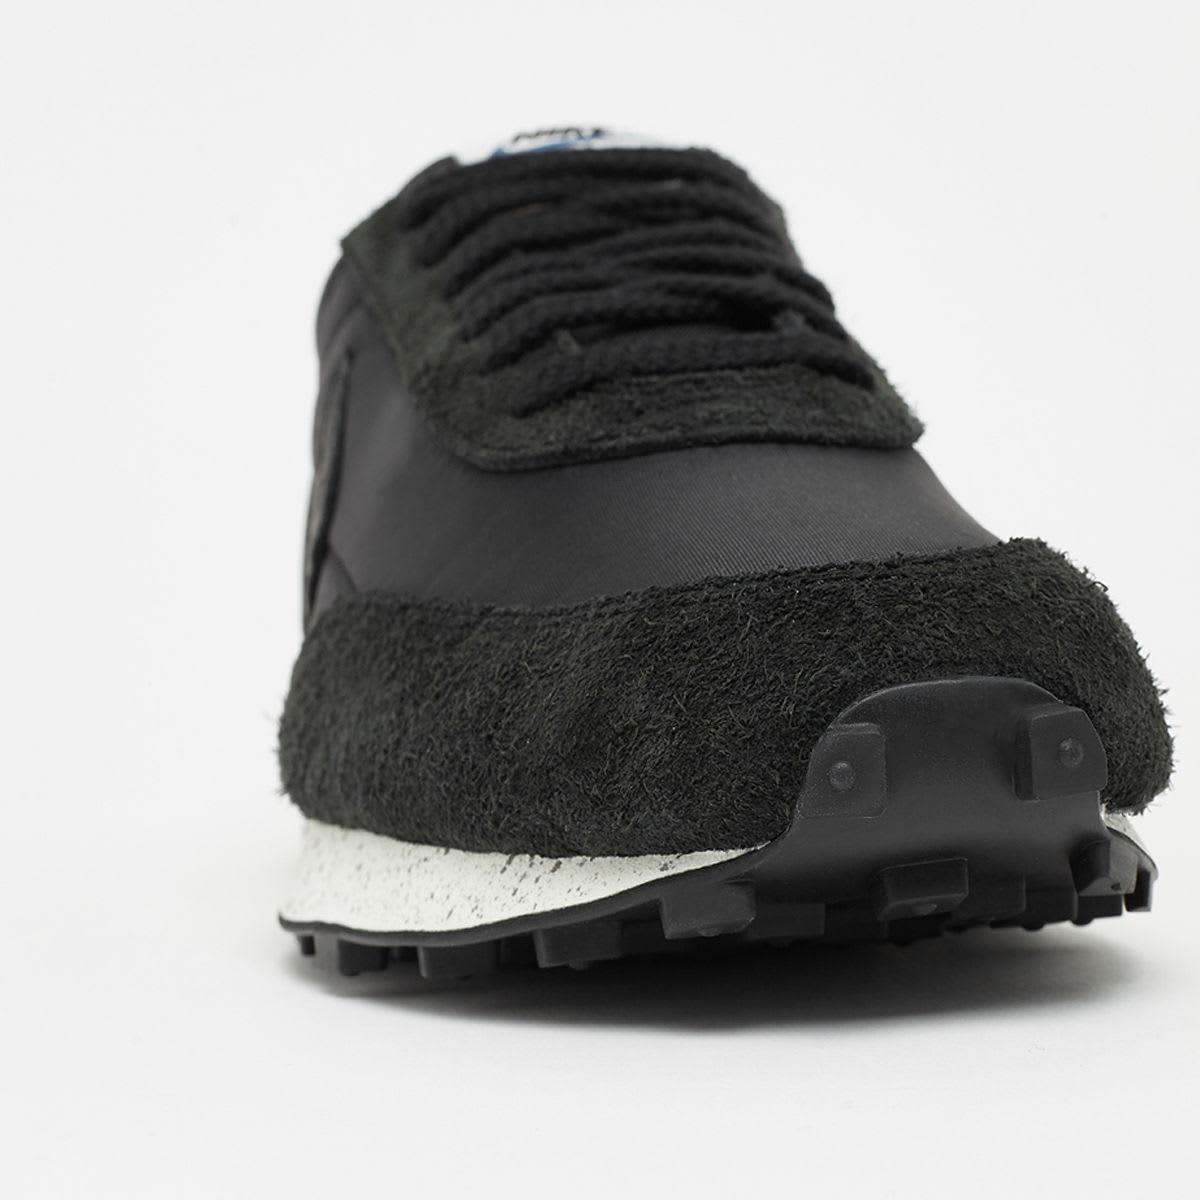 Undercover x Nike Daybreak CJ3295-001 (Toe)